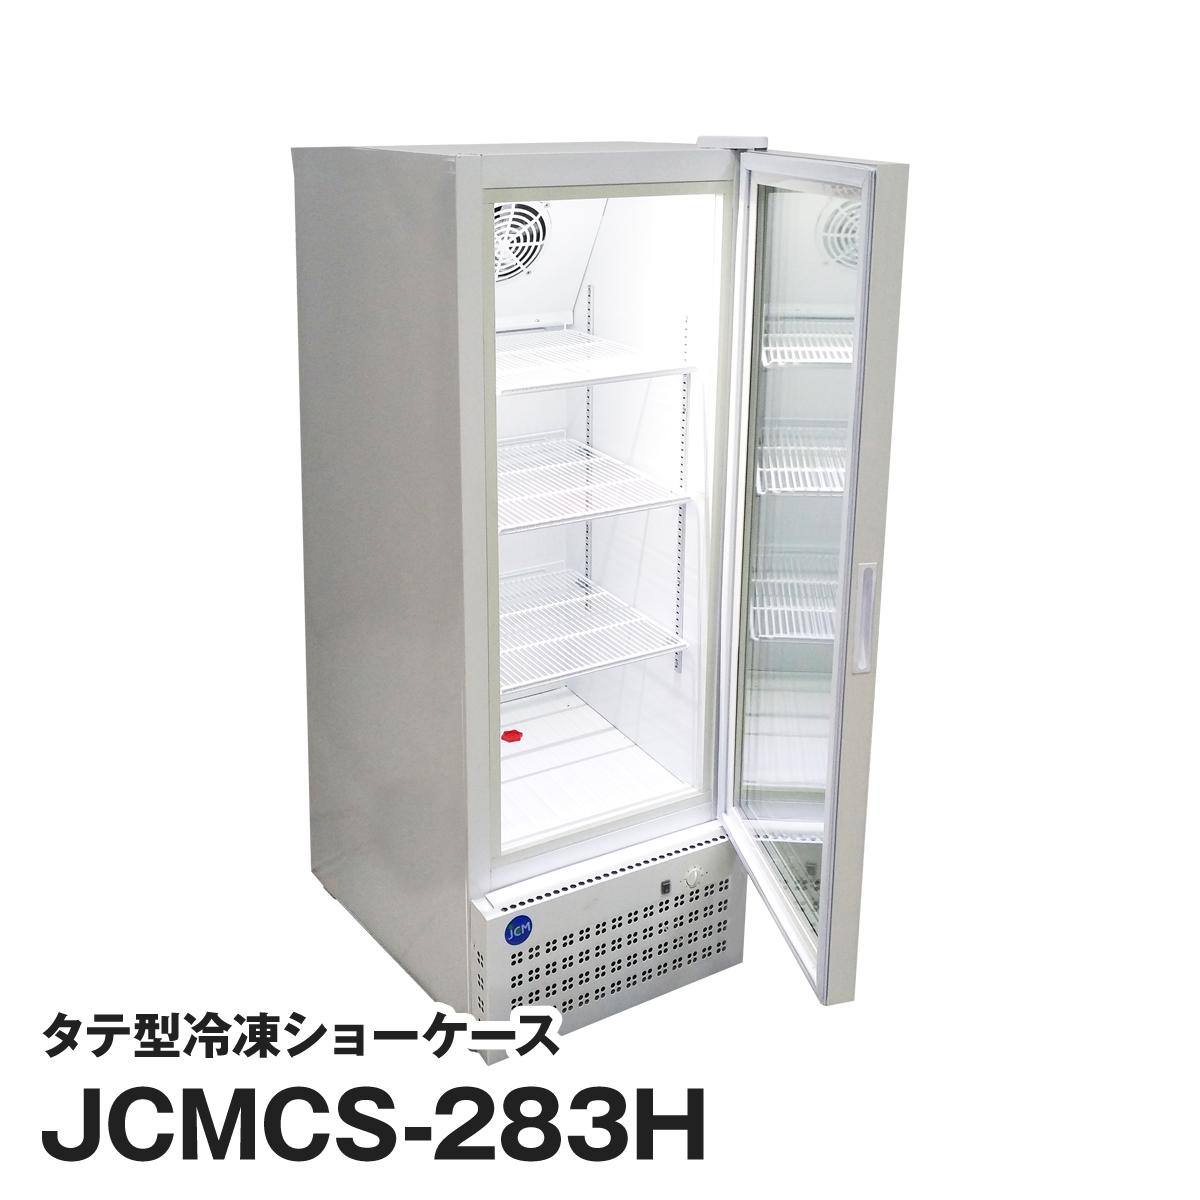 JCM社製 業務用 保冷庫 冷凍庫 283L タテ型冷凍ショーケース JCMCS-283H 新品